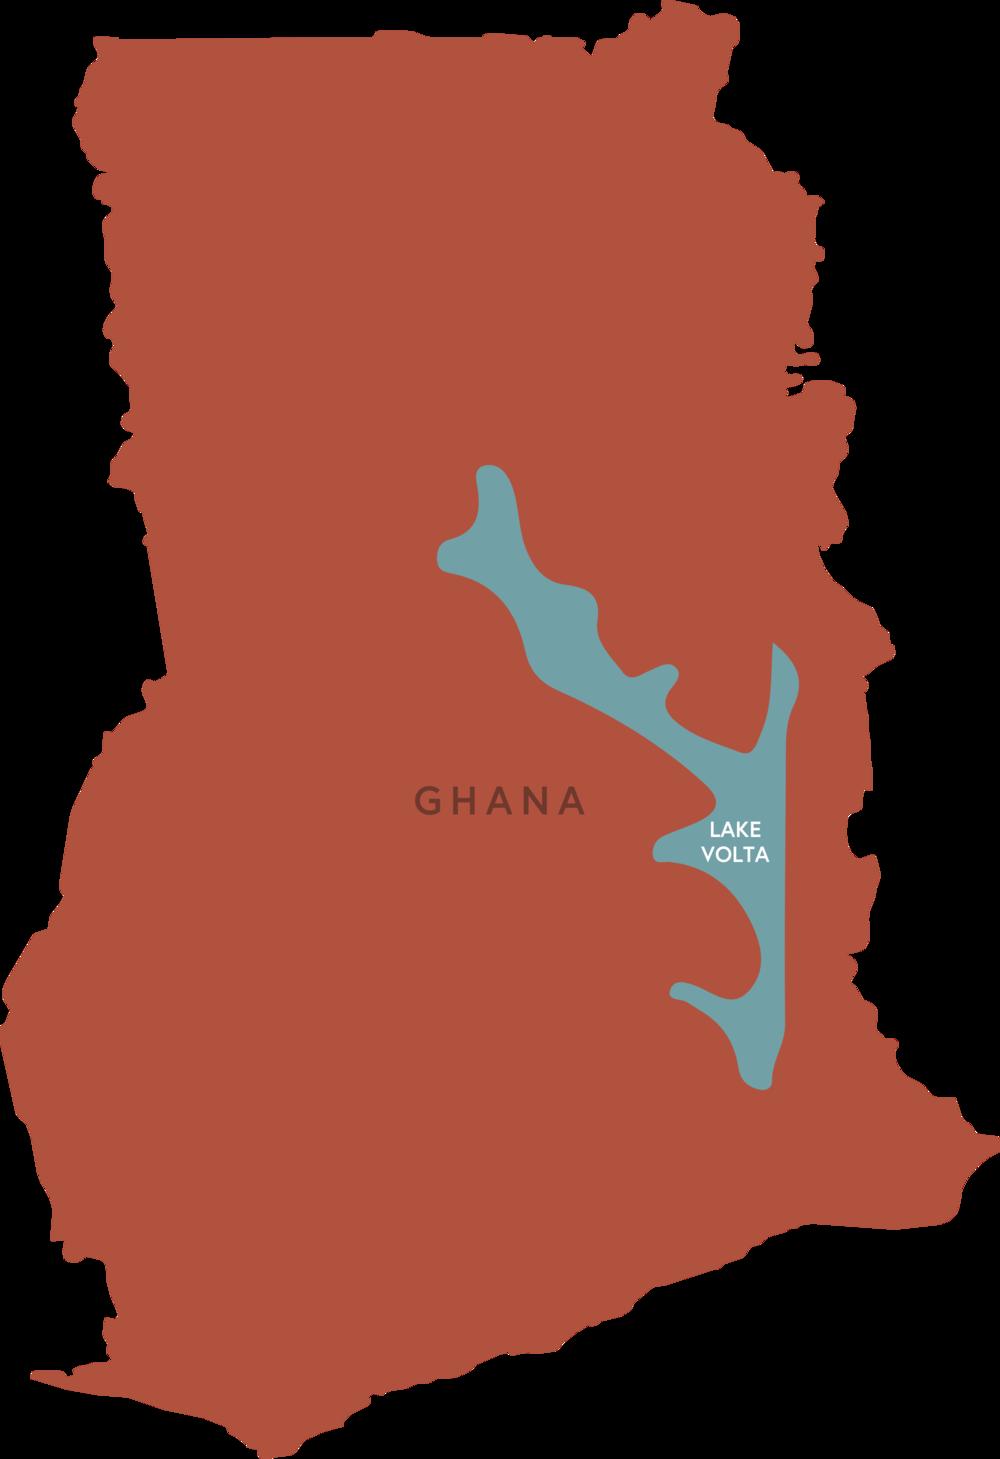 ghana-map.png